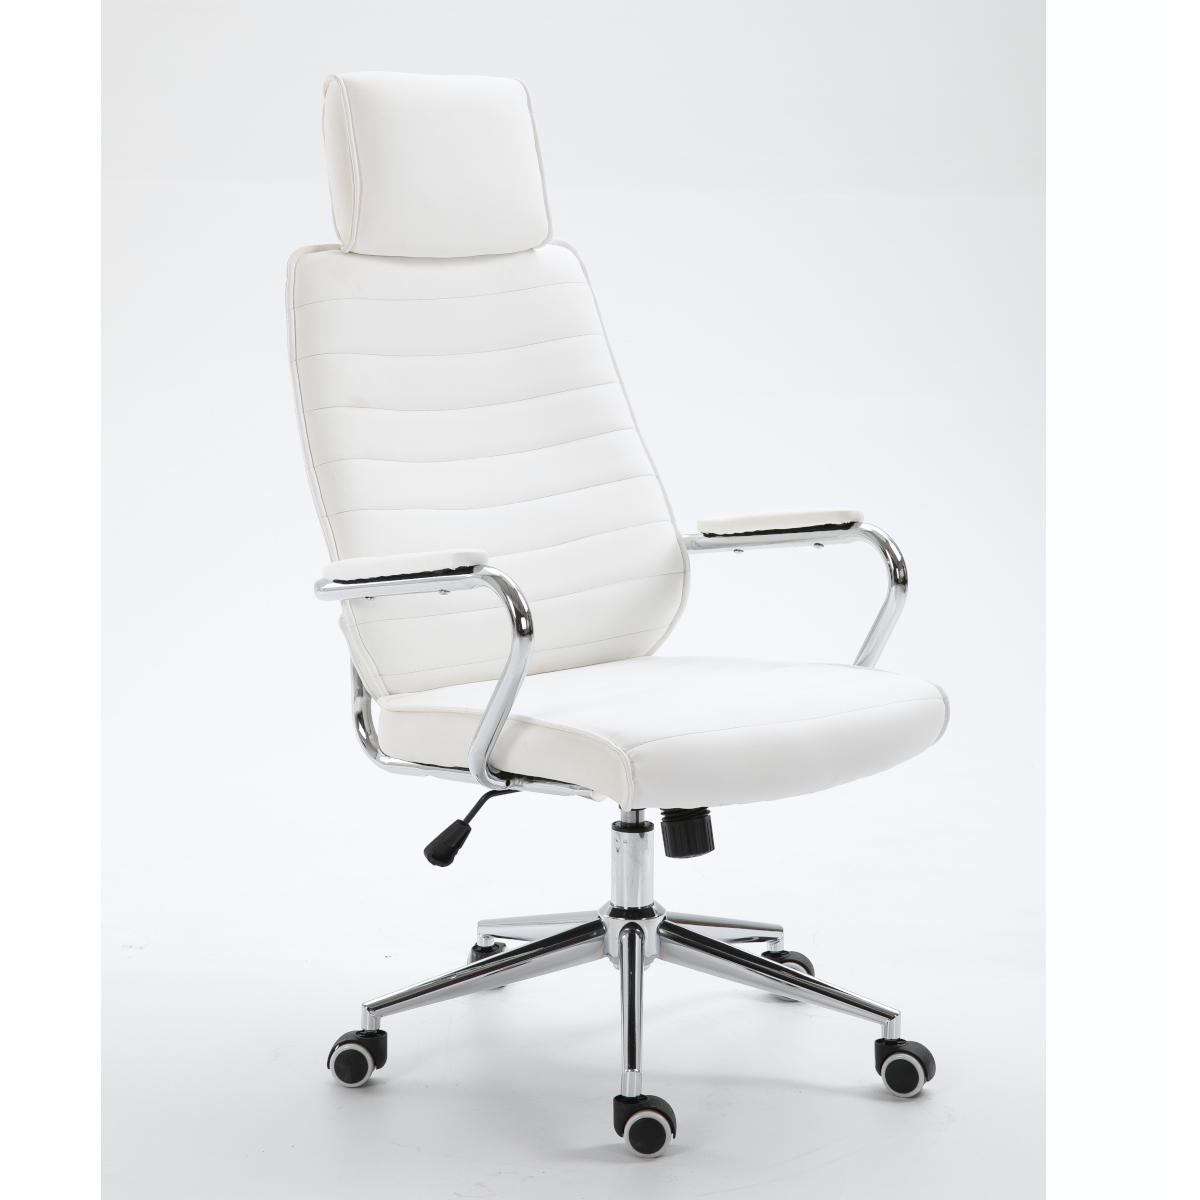 90451 SVITA Bürostuhl mit Kopfstütze weiß